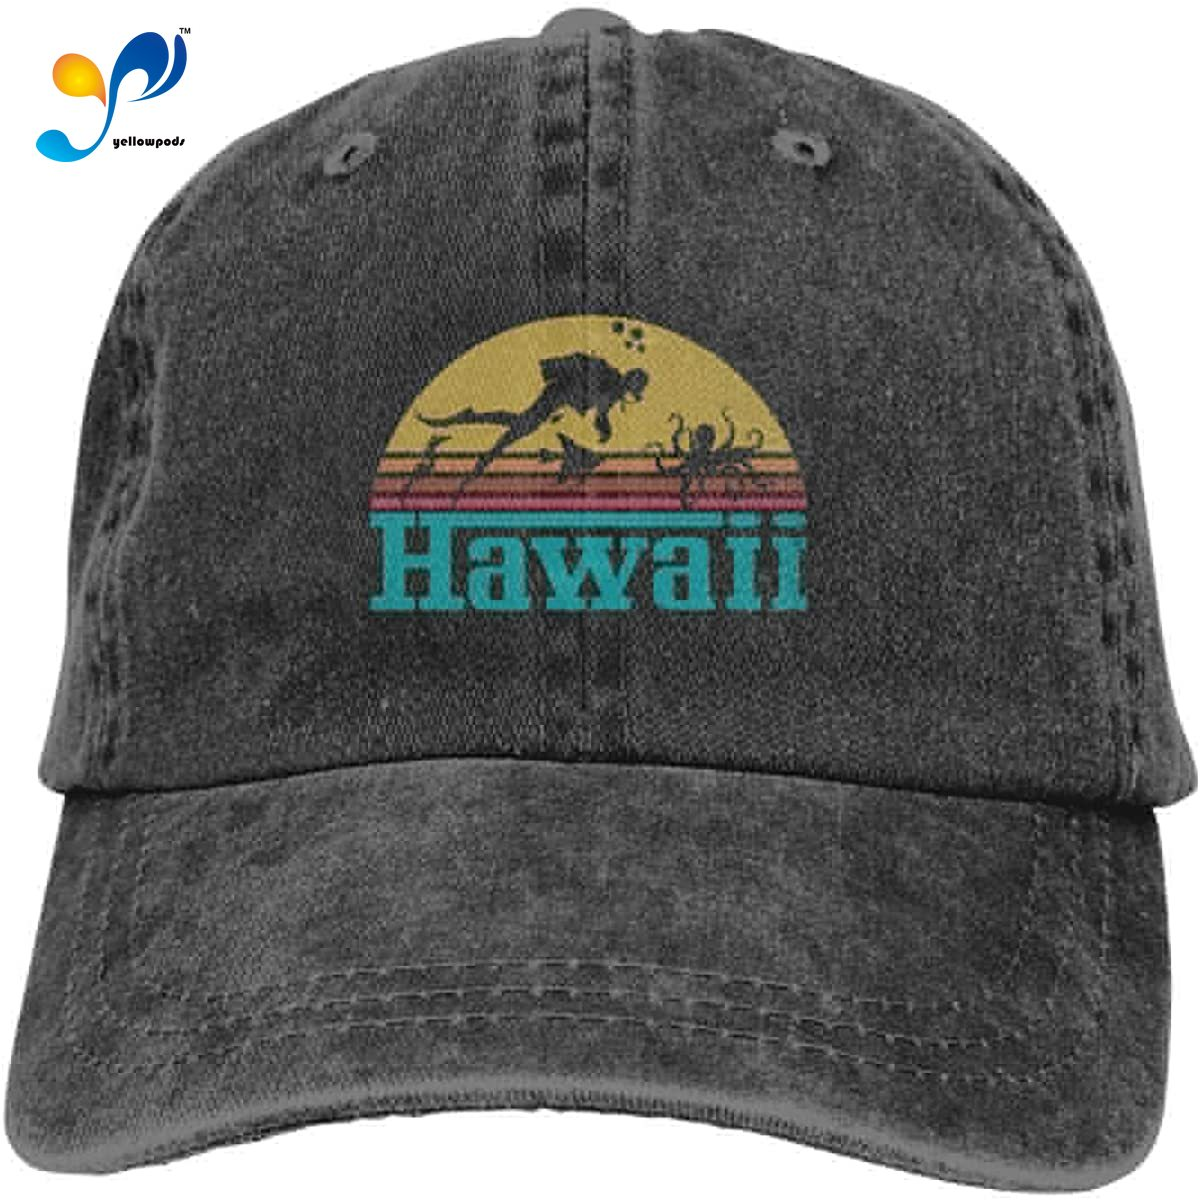 Vintage 1980style s estilo hawaii unisex macio casquette boné de beisebol chapéu moda vintage ajustável